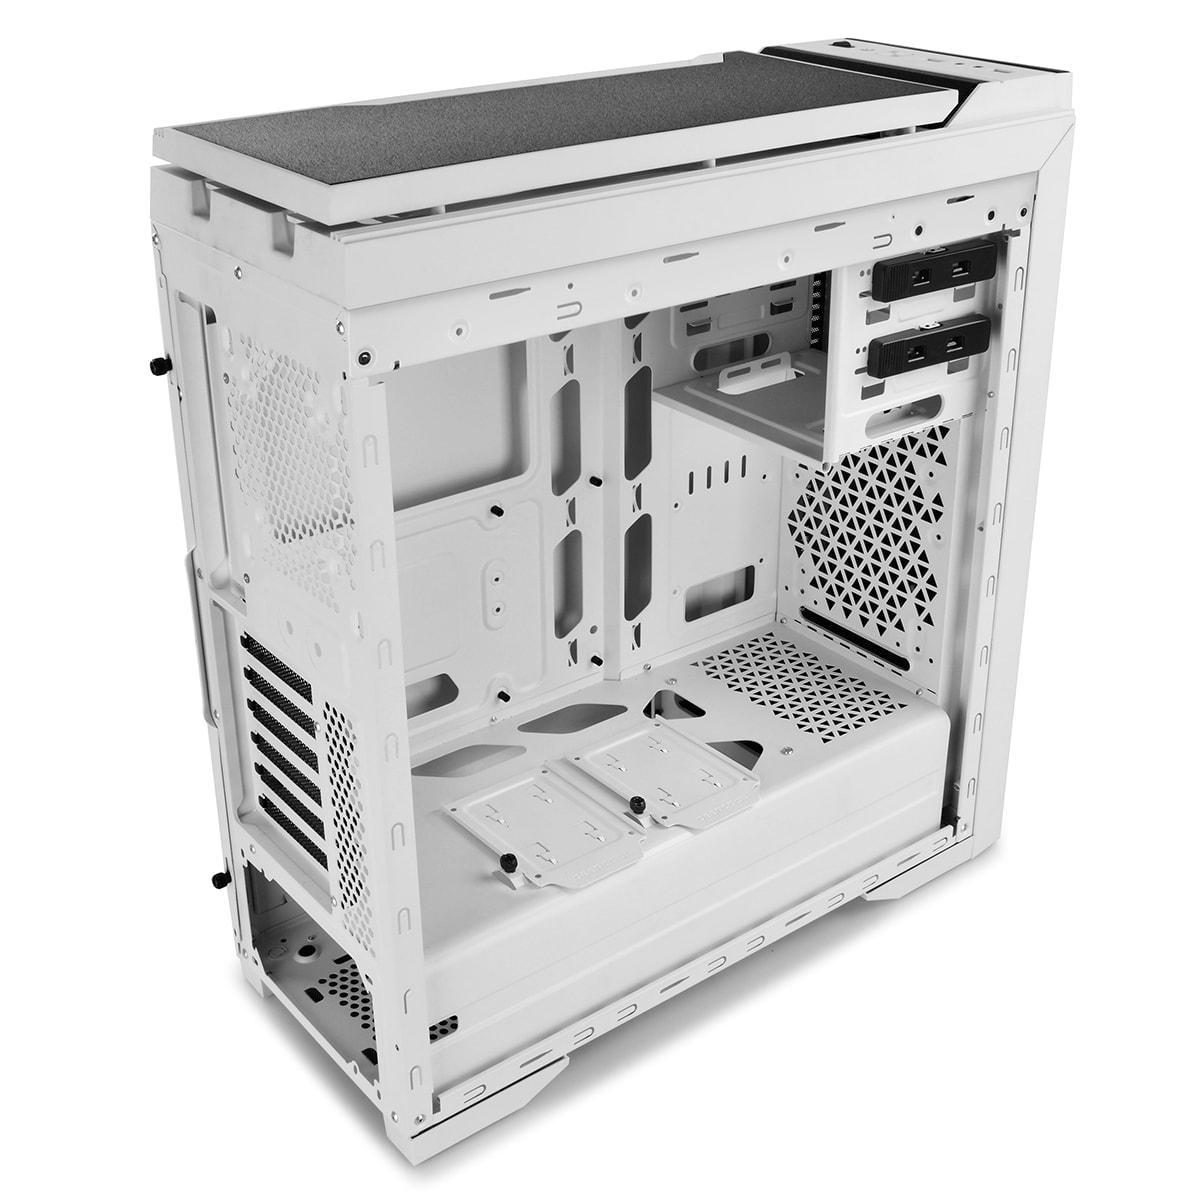 Deepcool DUKASE V2 Blanc - mT/Ss Alim/ATX (DUKASE WHV2) - Achat / Vente Boîtier PC sur Cybertek.fr - 3